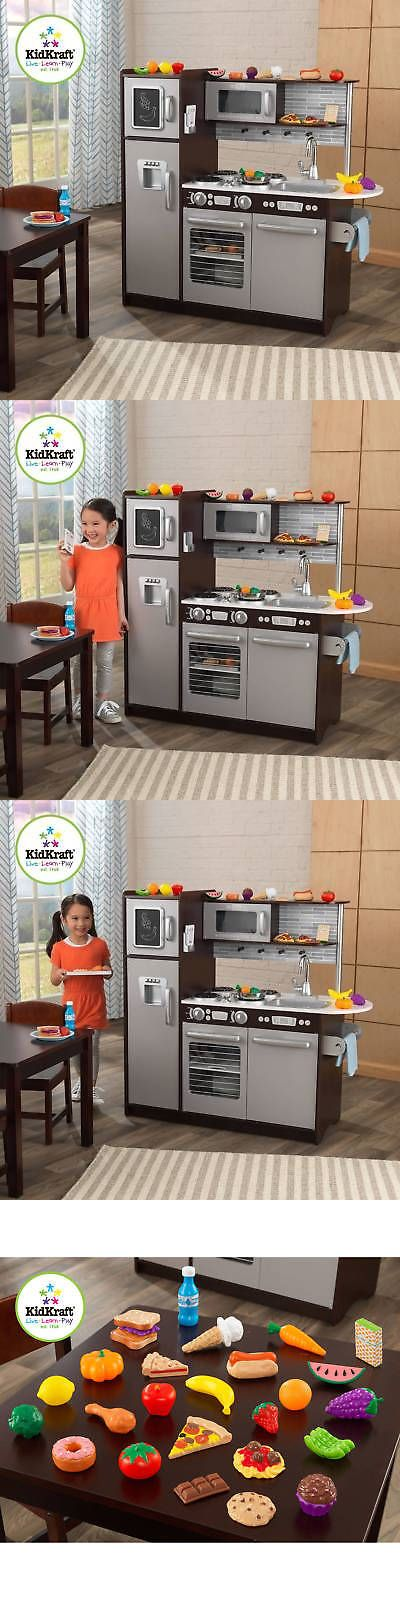 Más de 20 ideas increíbles sobre Küche kaufen ebay en Pinterest - ebay küchen kaufen